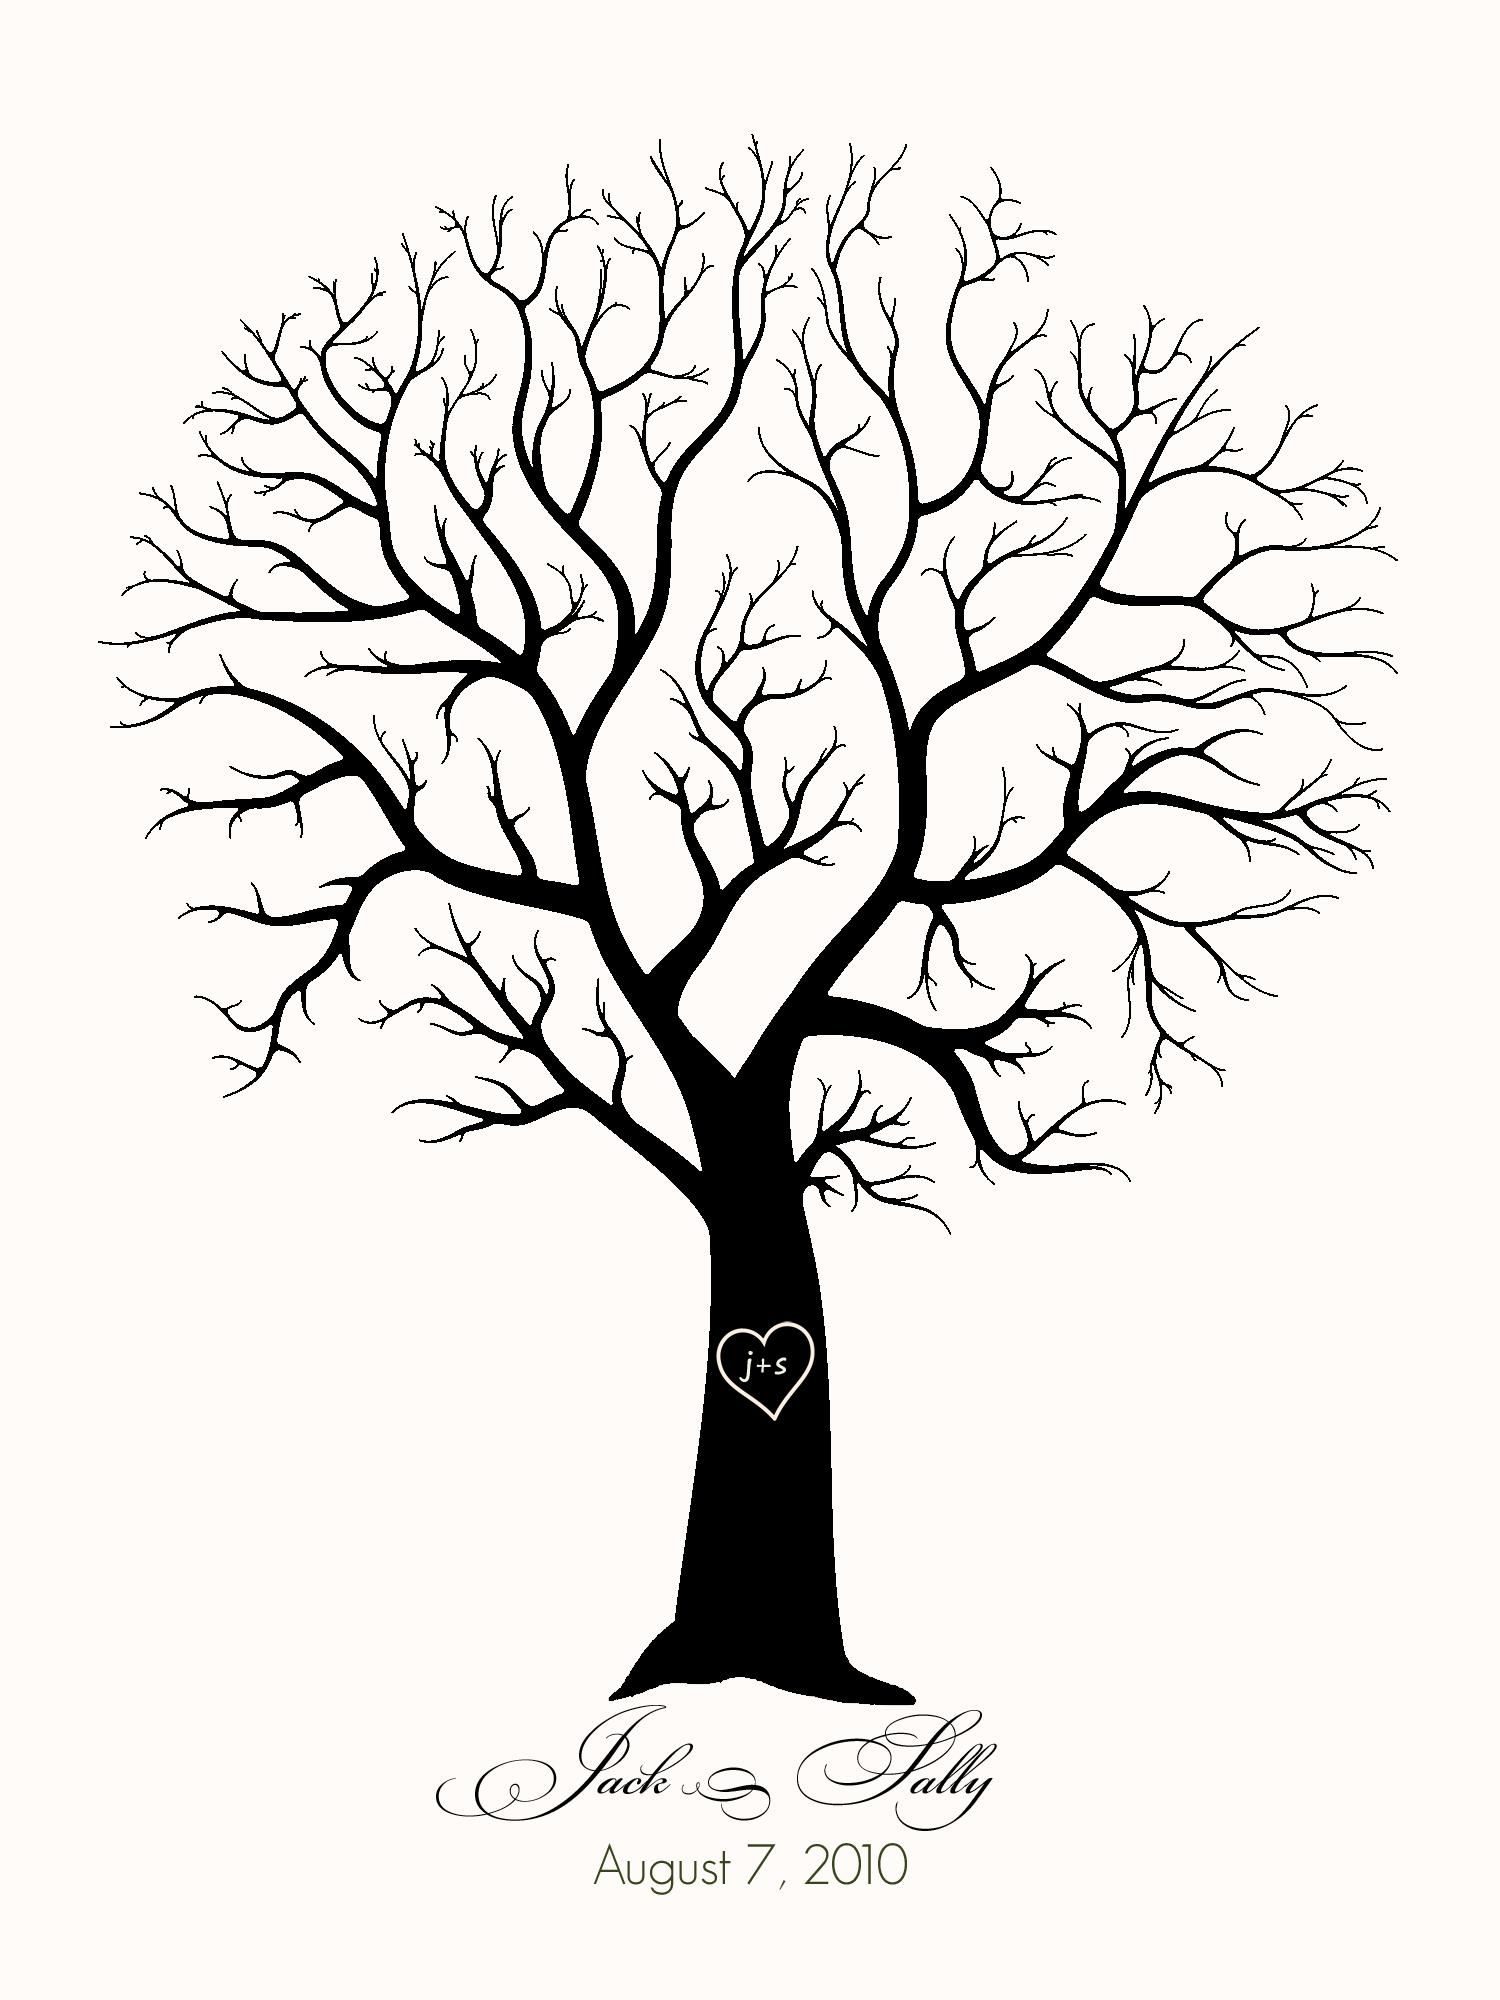 Wedding Tree Drawing At Getdrawings